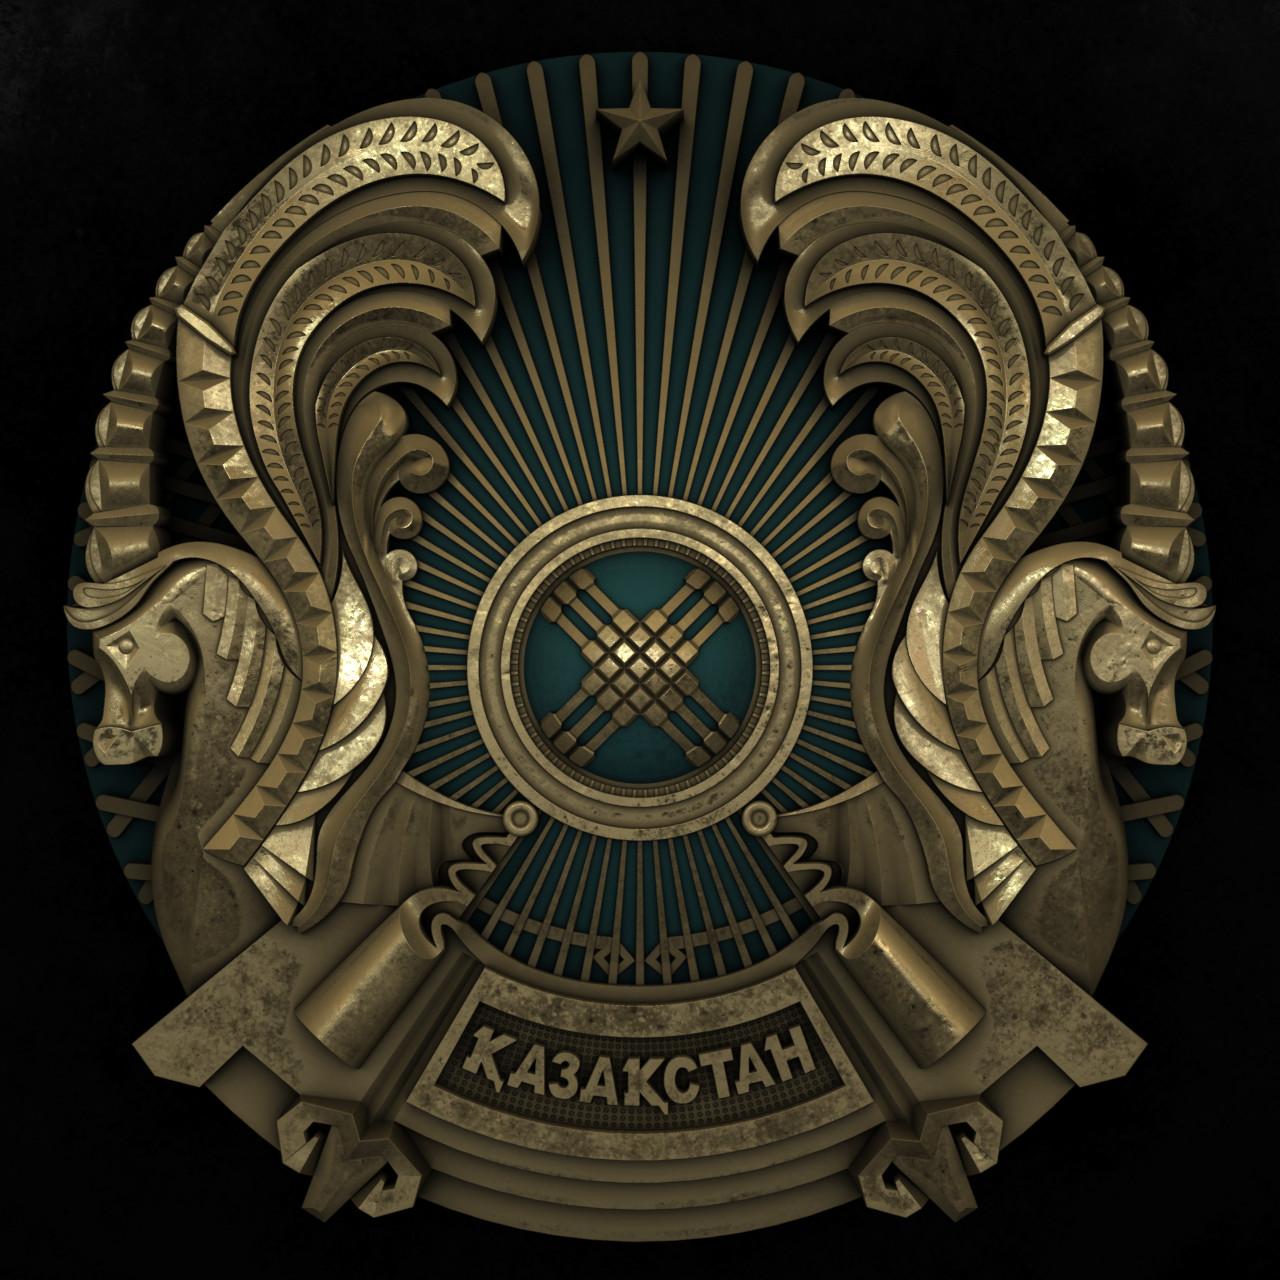 NURBS to PBR Texture - Emblem of Kazakhstan